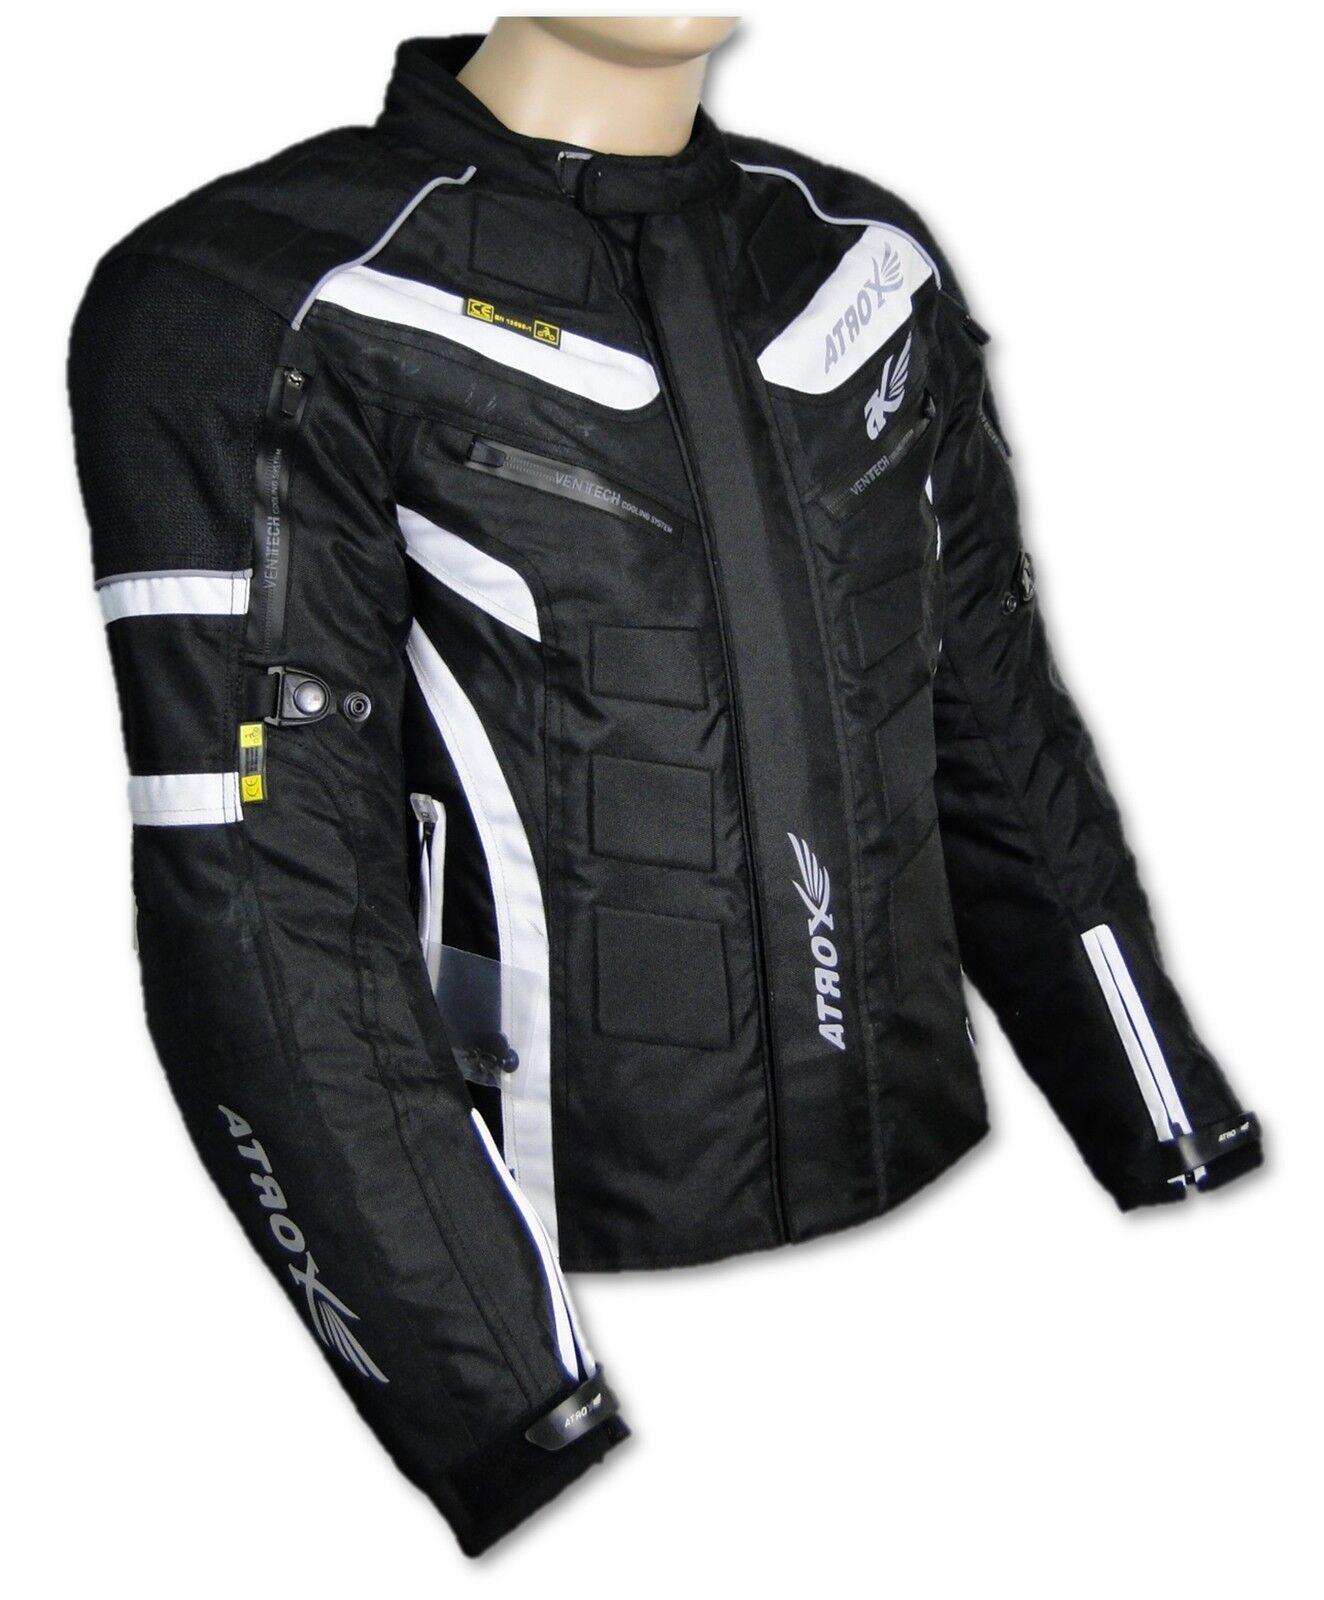 Chaqueta de moto, Cordura Textil ropa Motocicleta ATROX gr. 3xl